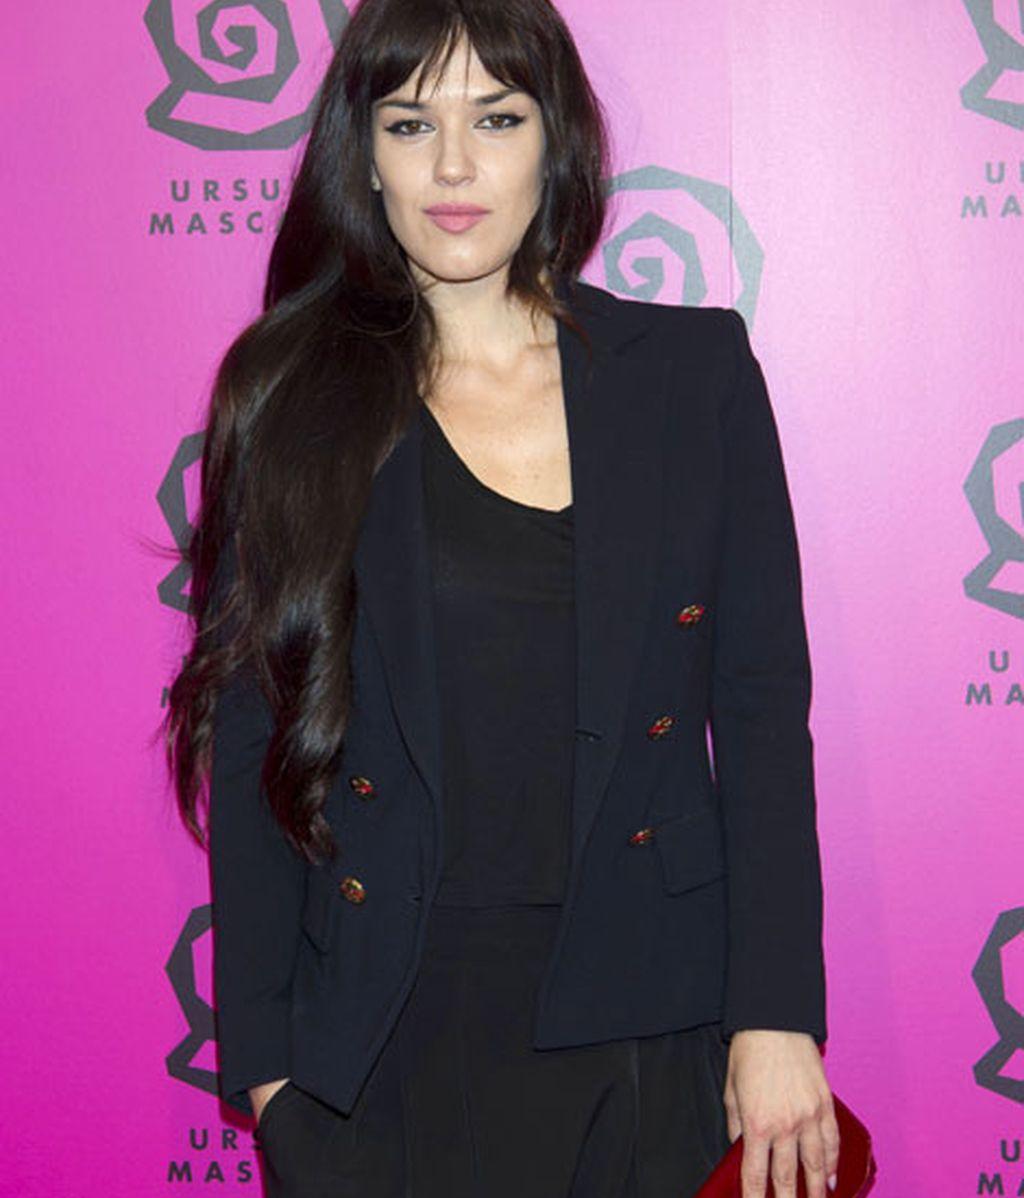 Sara Vega, hermana de Paz Vega, fue vestida de negro también